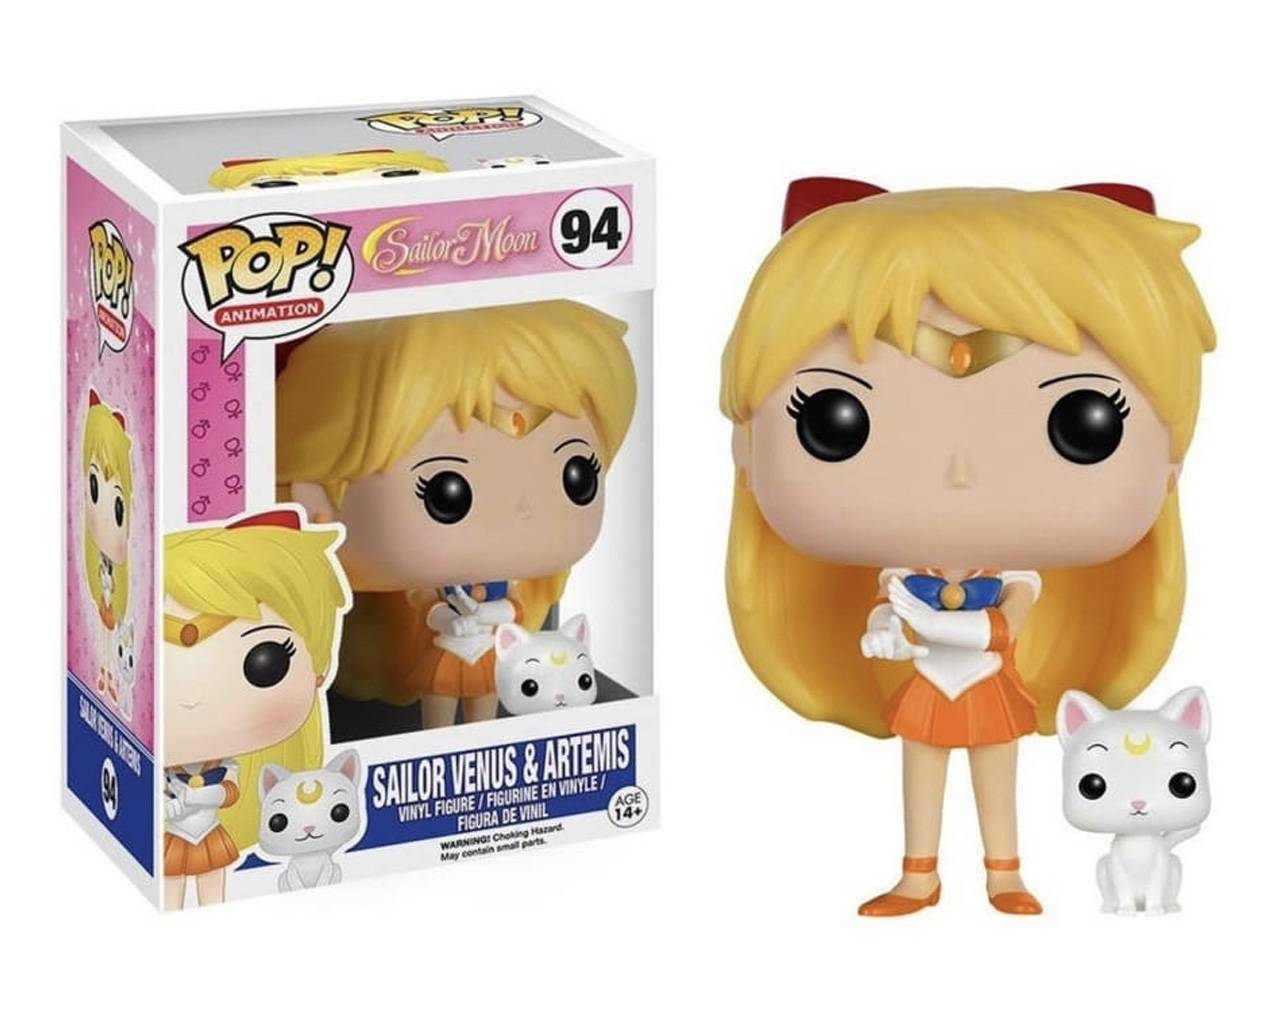 Sailor Venus & Artemis Pop! Vinyl